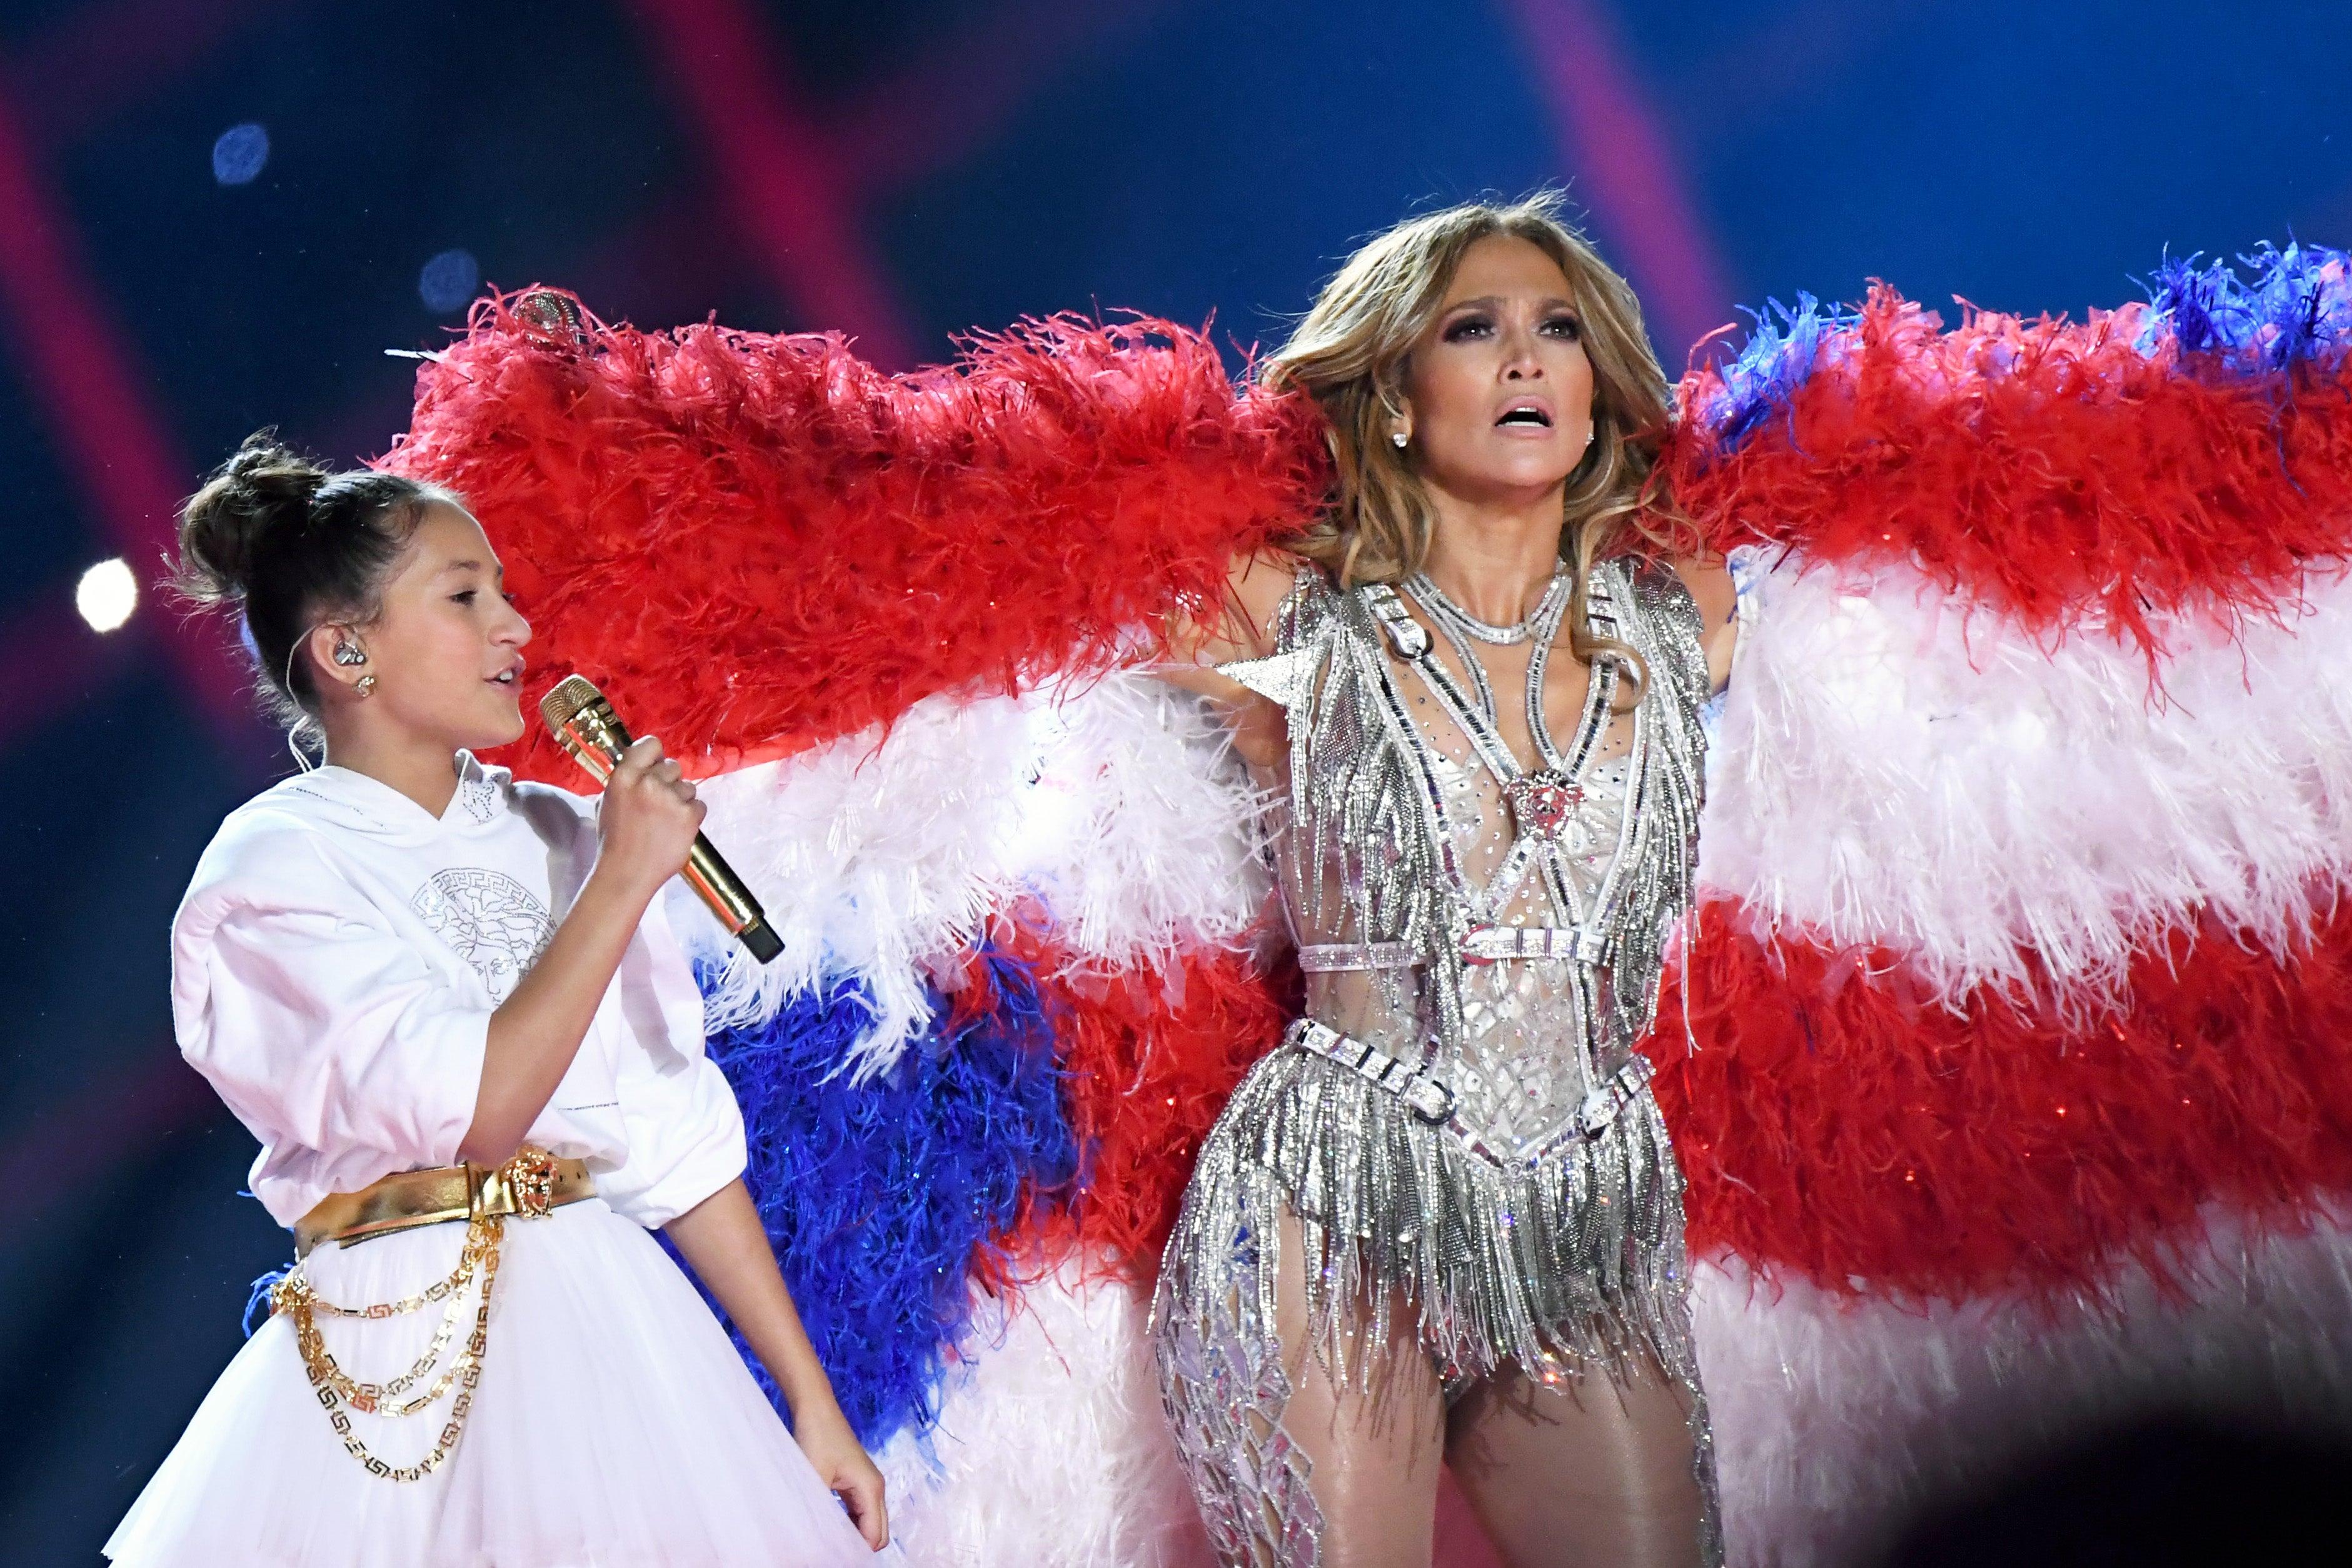 Jennifer Lopez se svou dcerou Emme Maribel Muñiz, 2020 Autor: Jeff Kravitz/FilmMagic